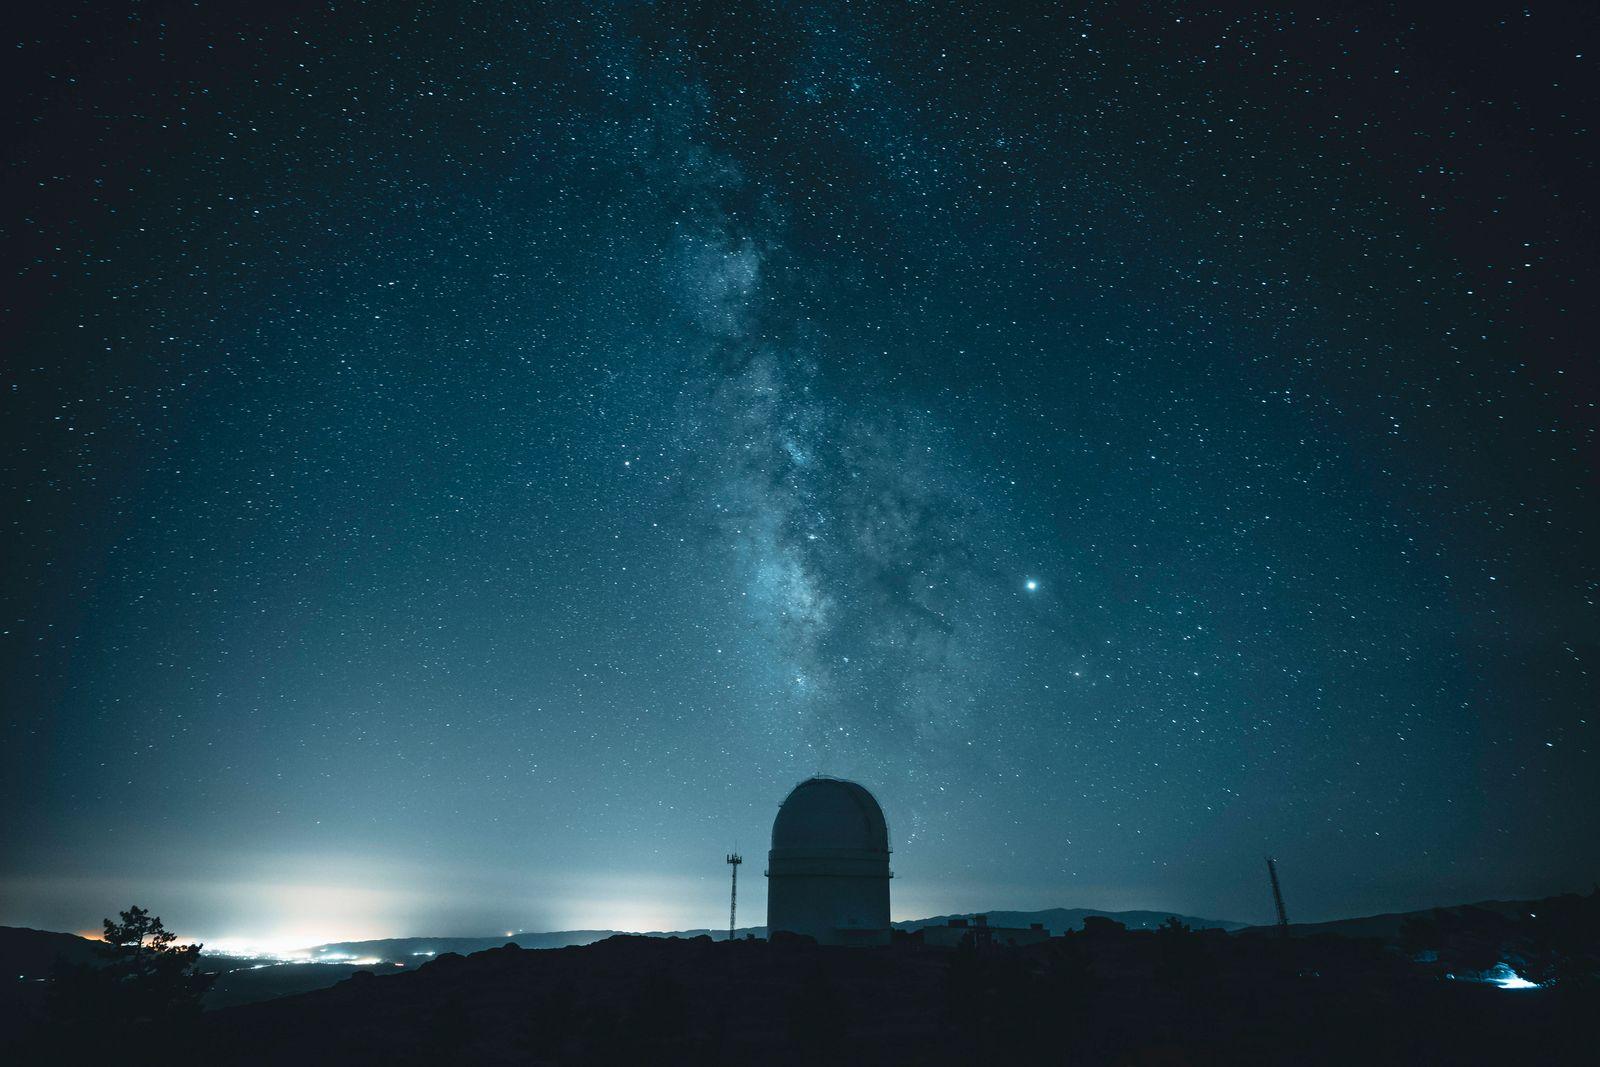 Spain, Province of Almeria, Milky Way galaxy over Calar Alto Observatory at night MPPF00700